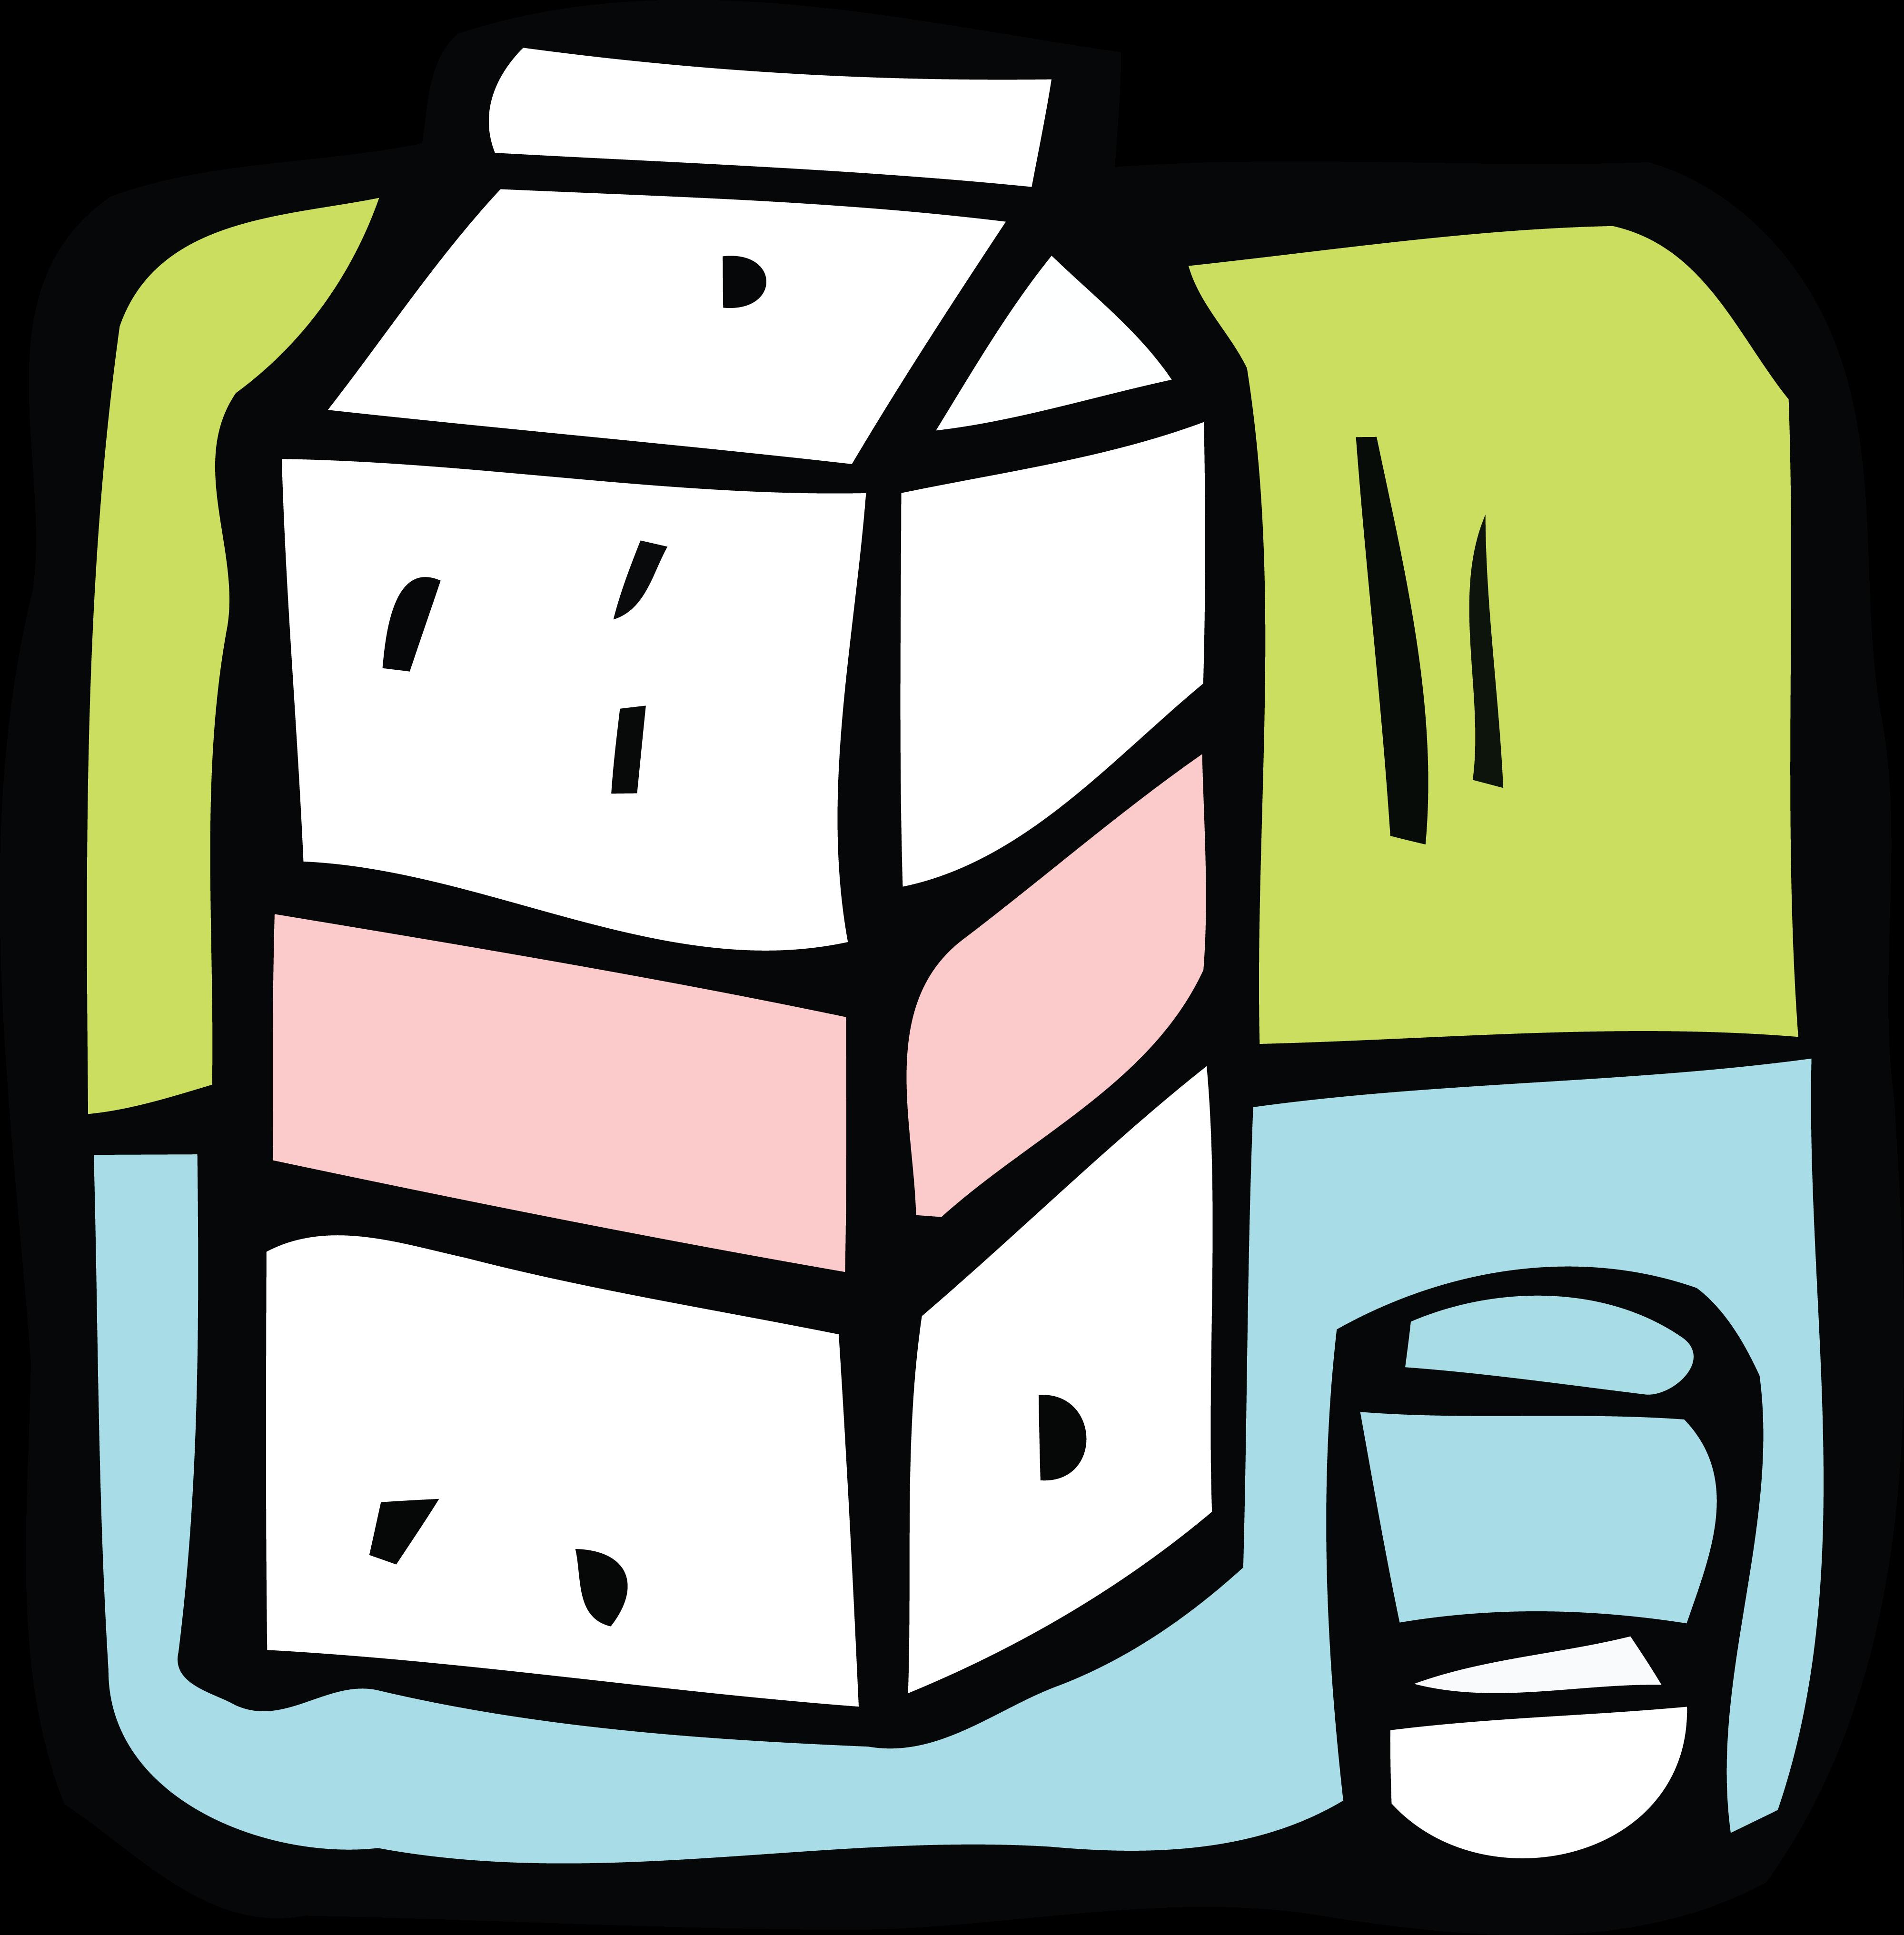 royalty free stock Milk clipart. Carton free of typegoodies.